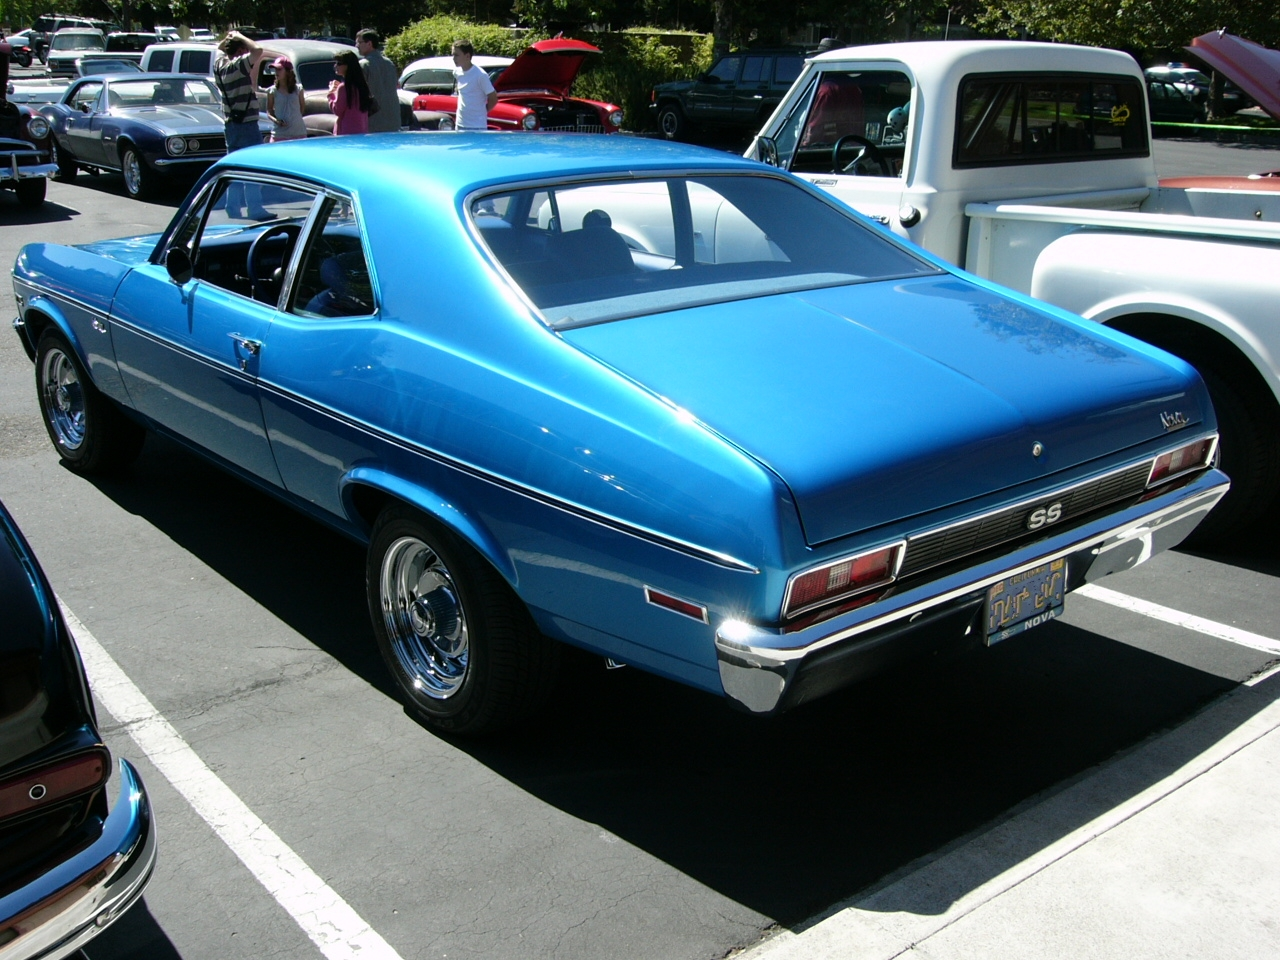 All Chevy 1971 chevrolet nova : 1971 Chevrolet Nova SS blue by RoadTripDog on DeviantArt